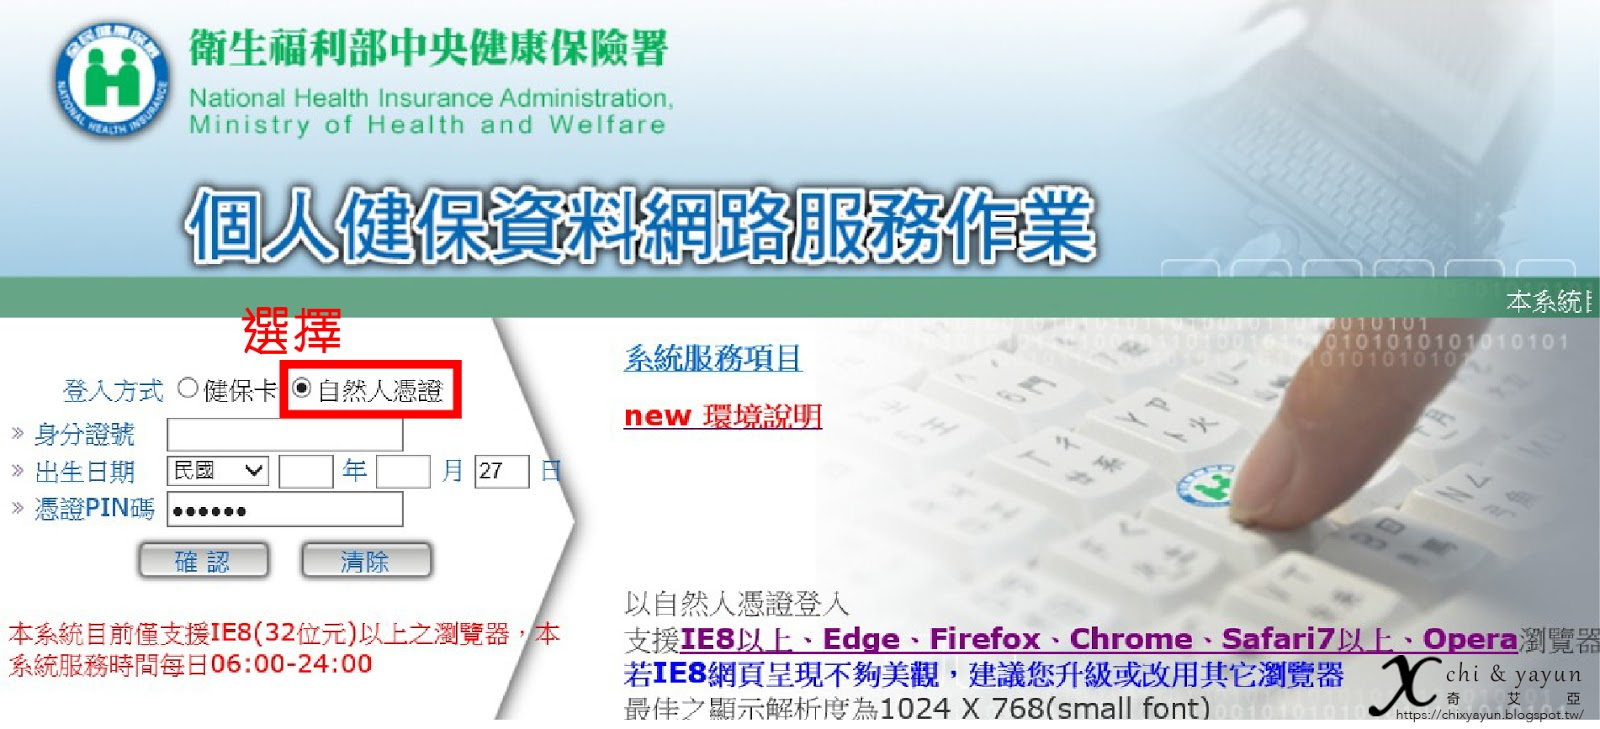 App|不用出門也可以將健保【紙本帳單】改成【電子帳單】 - 奇艾亞 chi & yayun